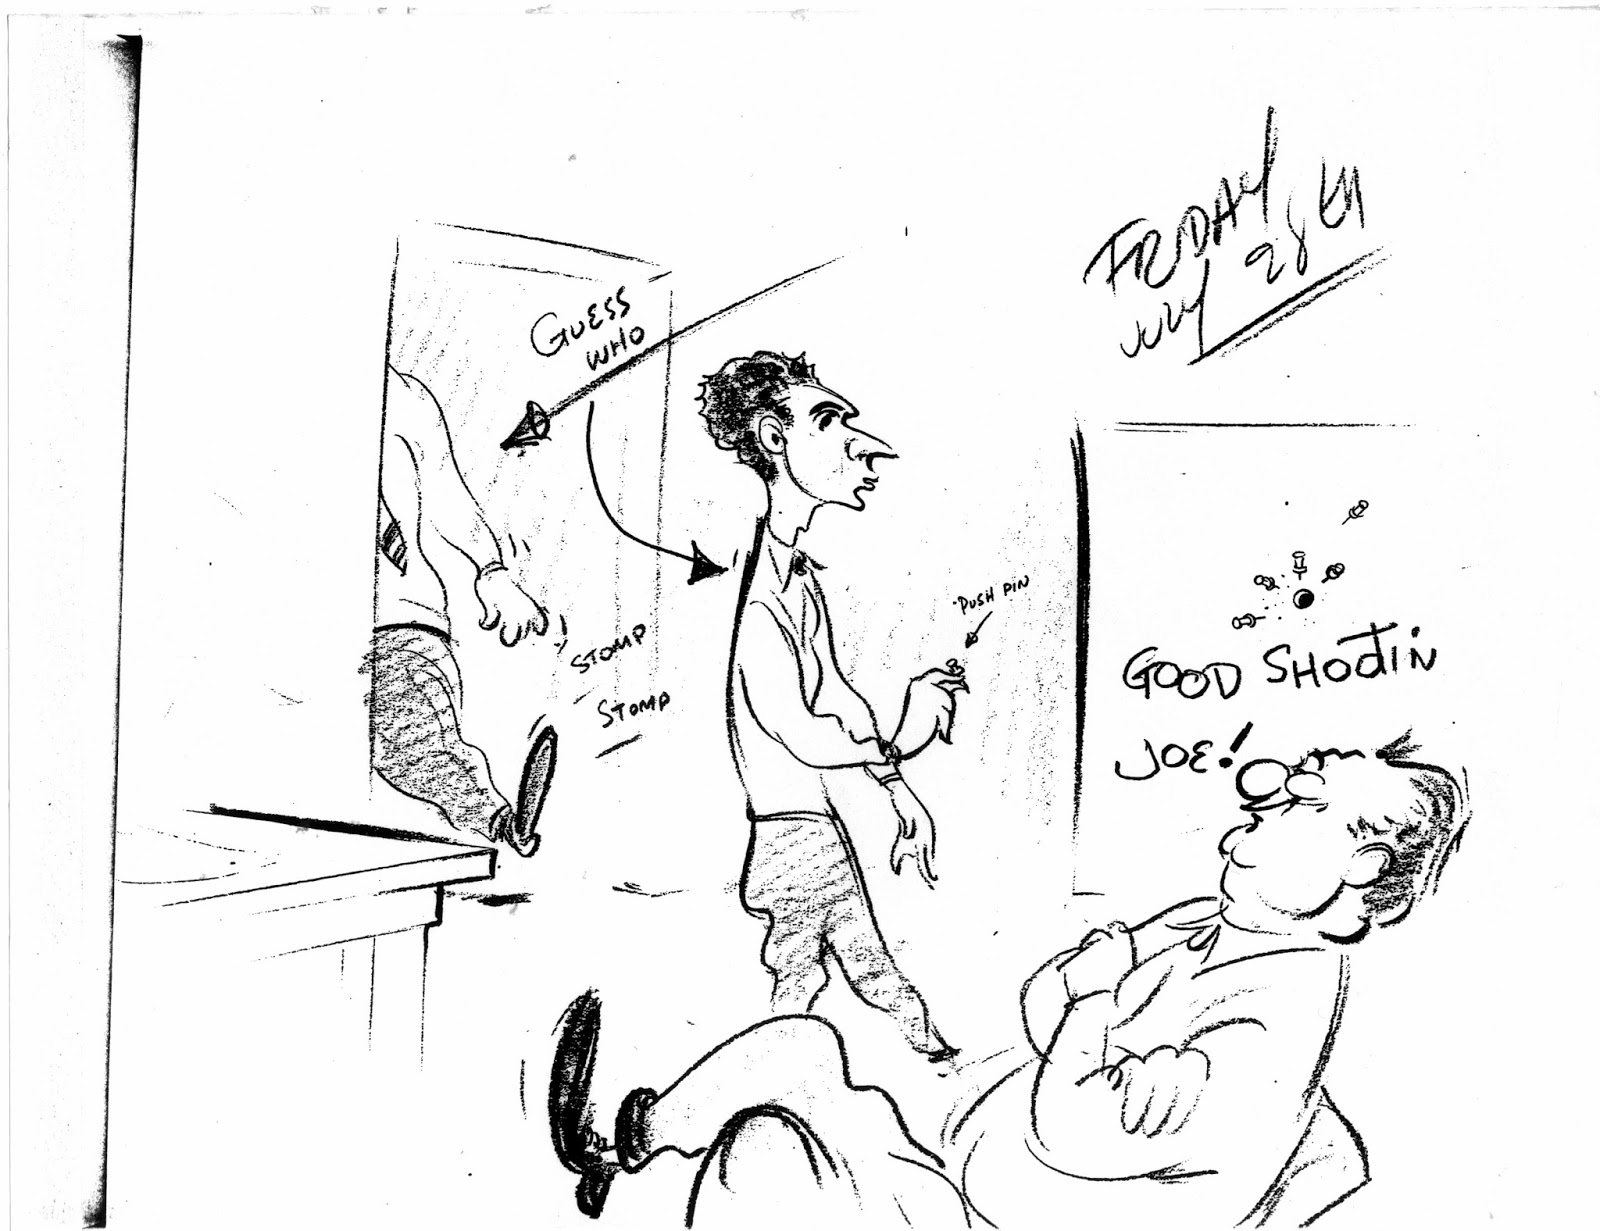 Filboid Studge: Irv Spence's Cartoon Diary: July 28, 1944